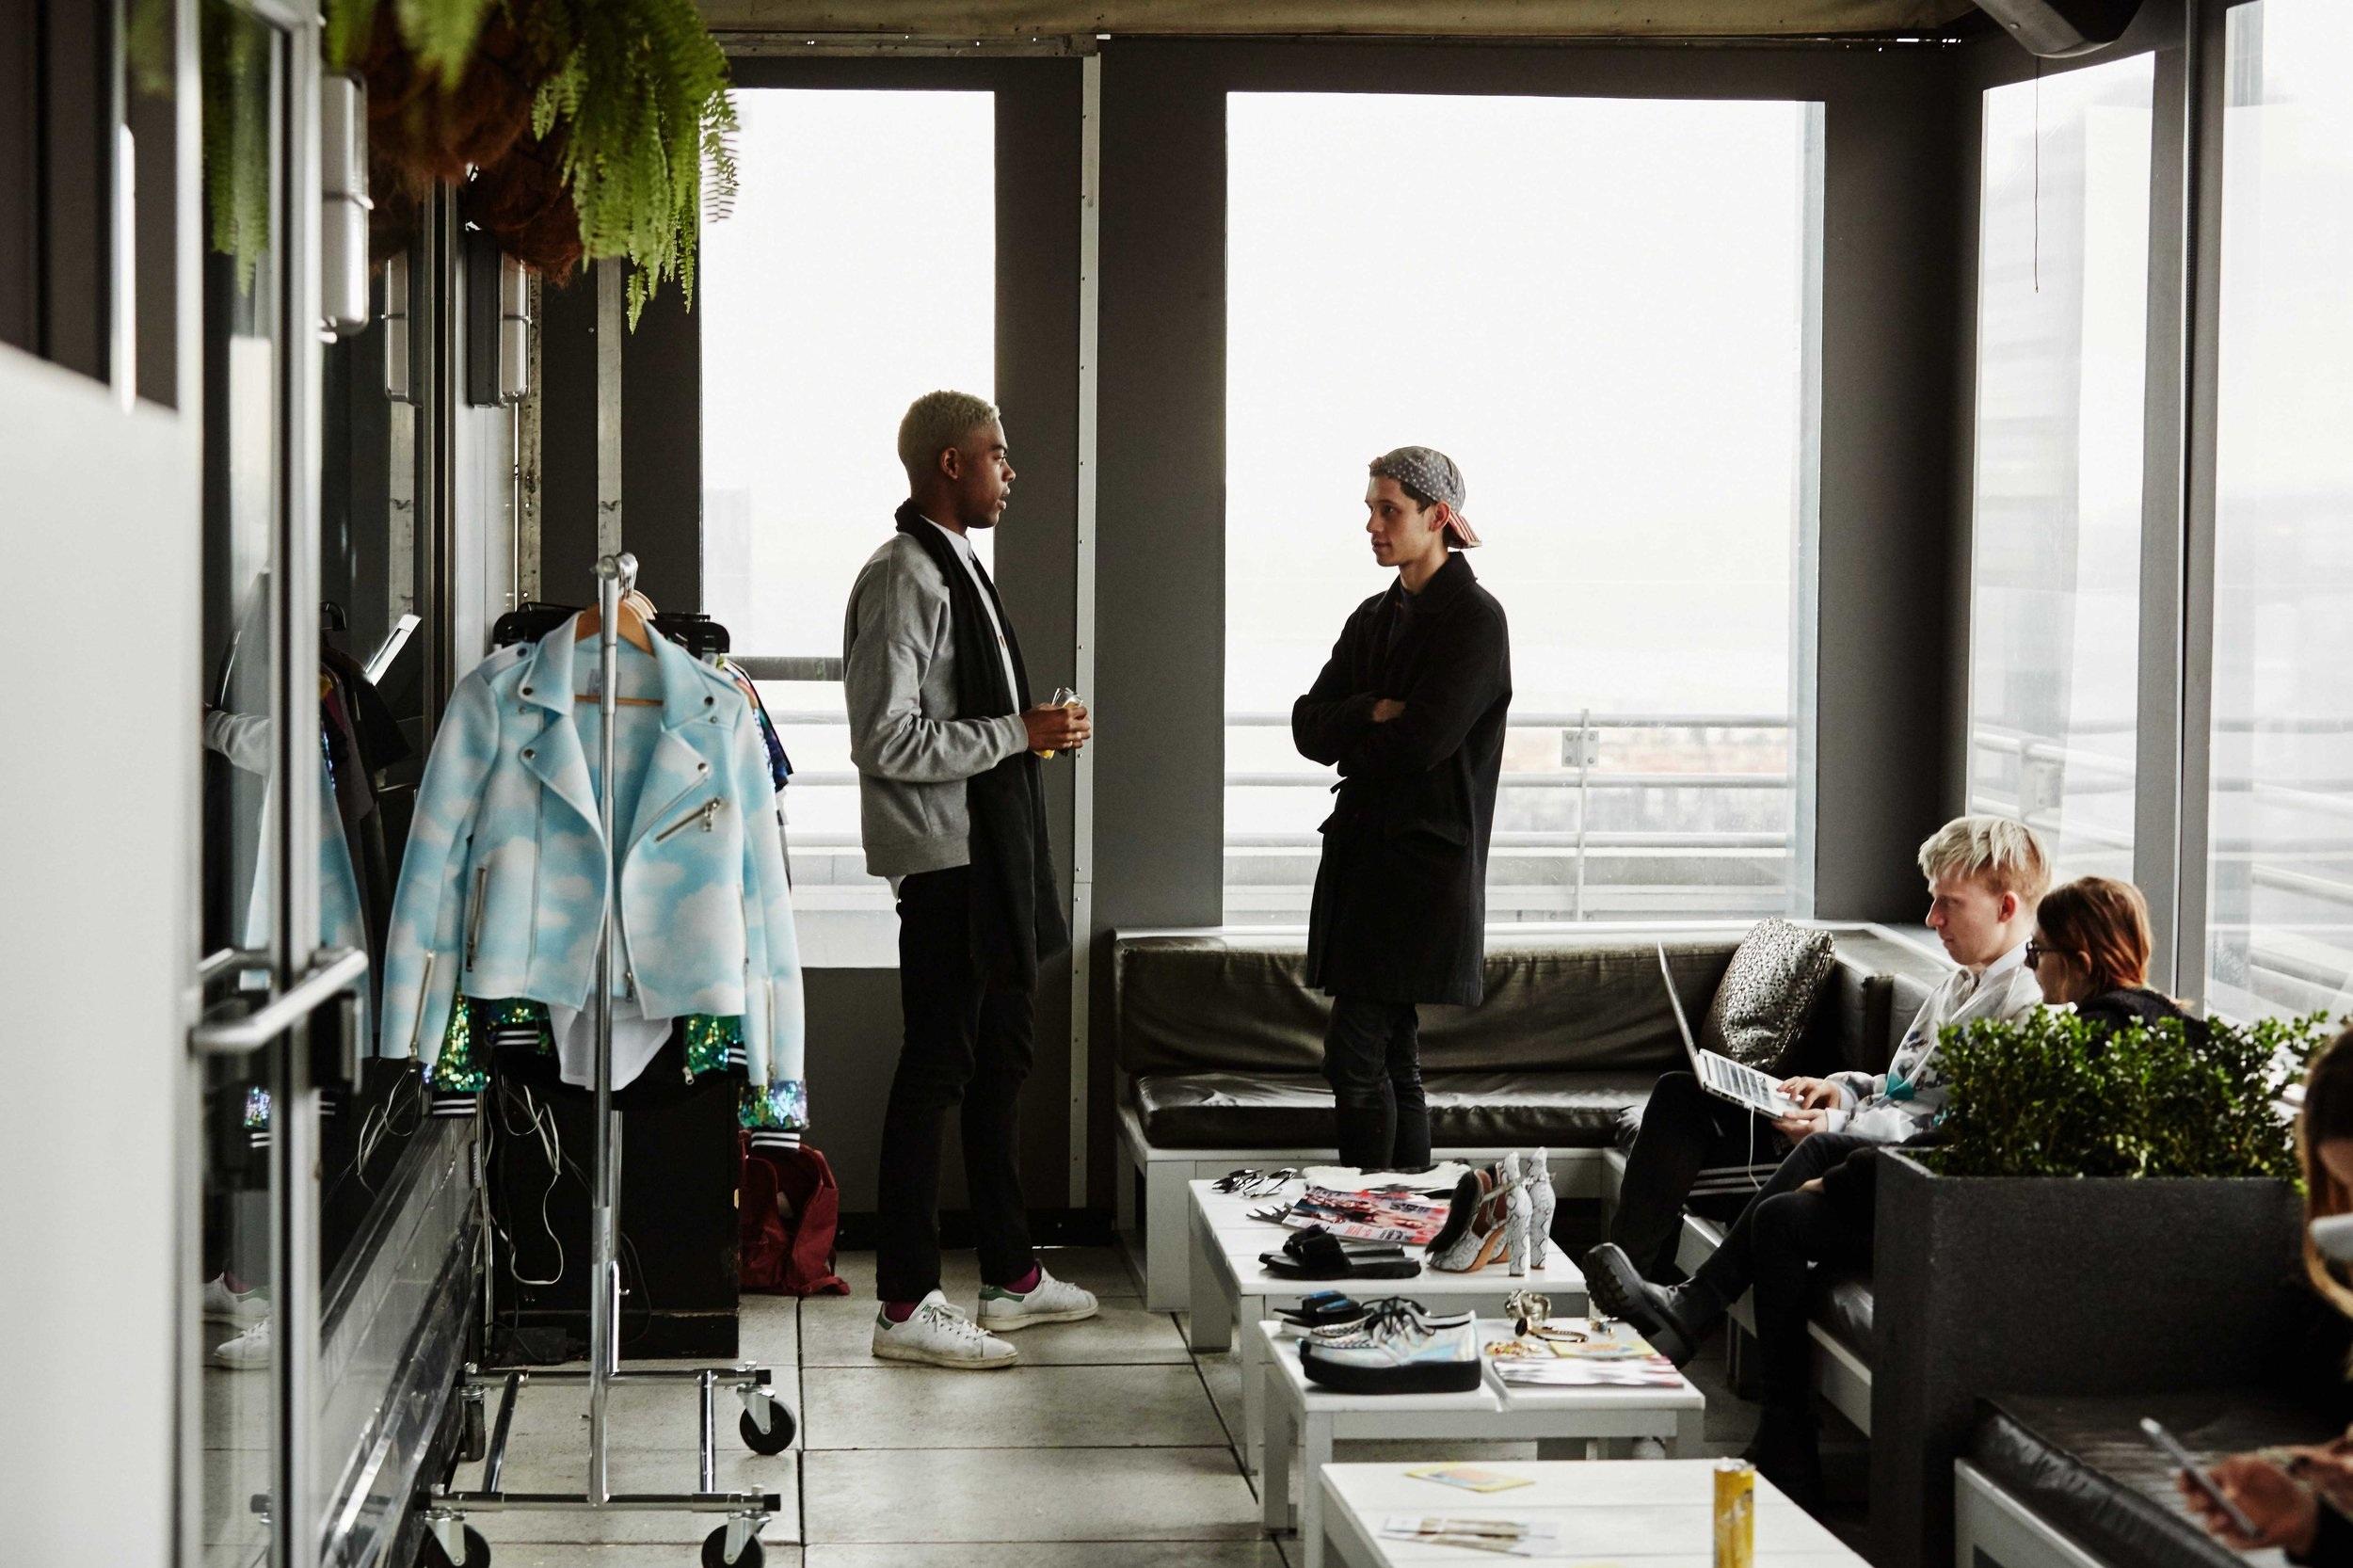 Nylon Magazine Pop Up, image courtesy of Gansevoort